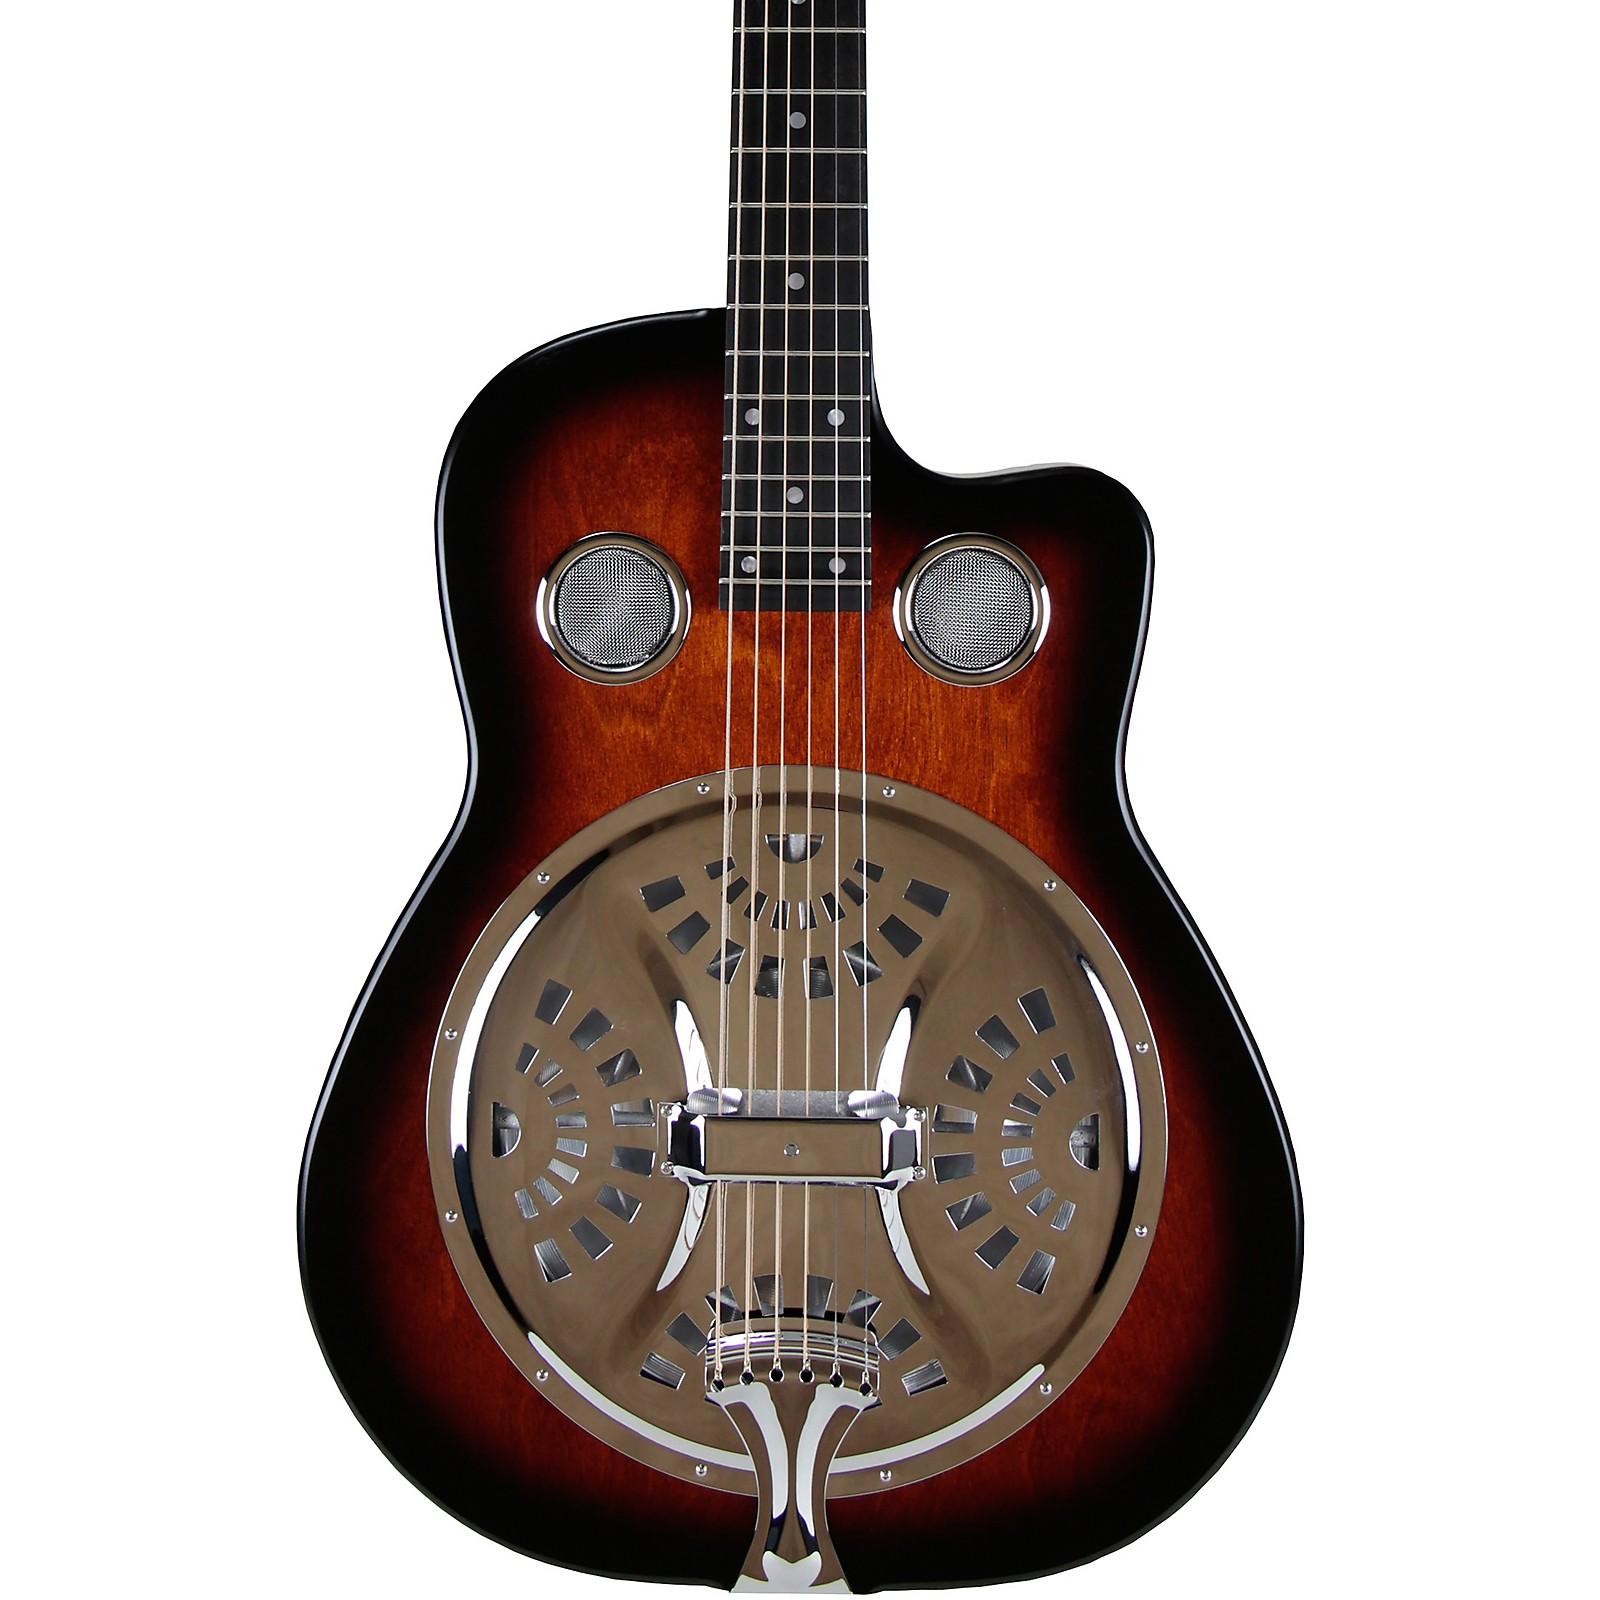 Beard Guitars Copper Mountain Roundneck Resonator Guitar